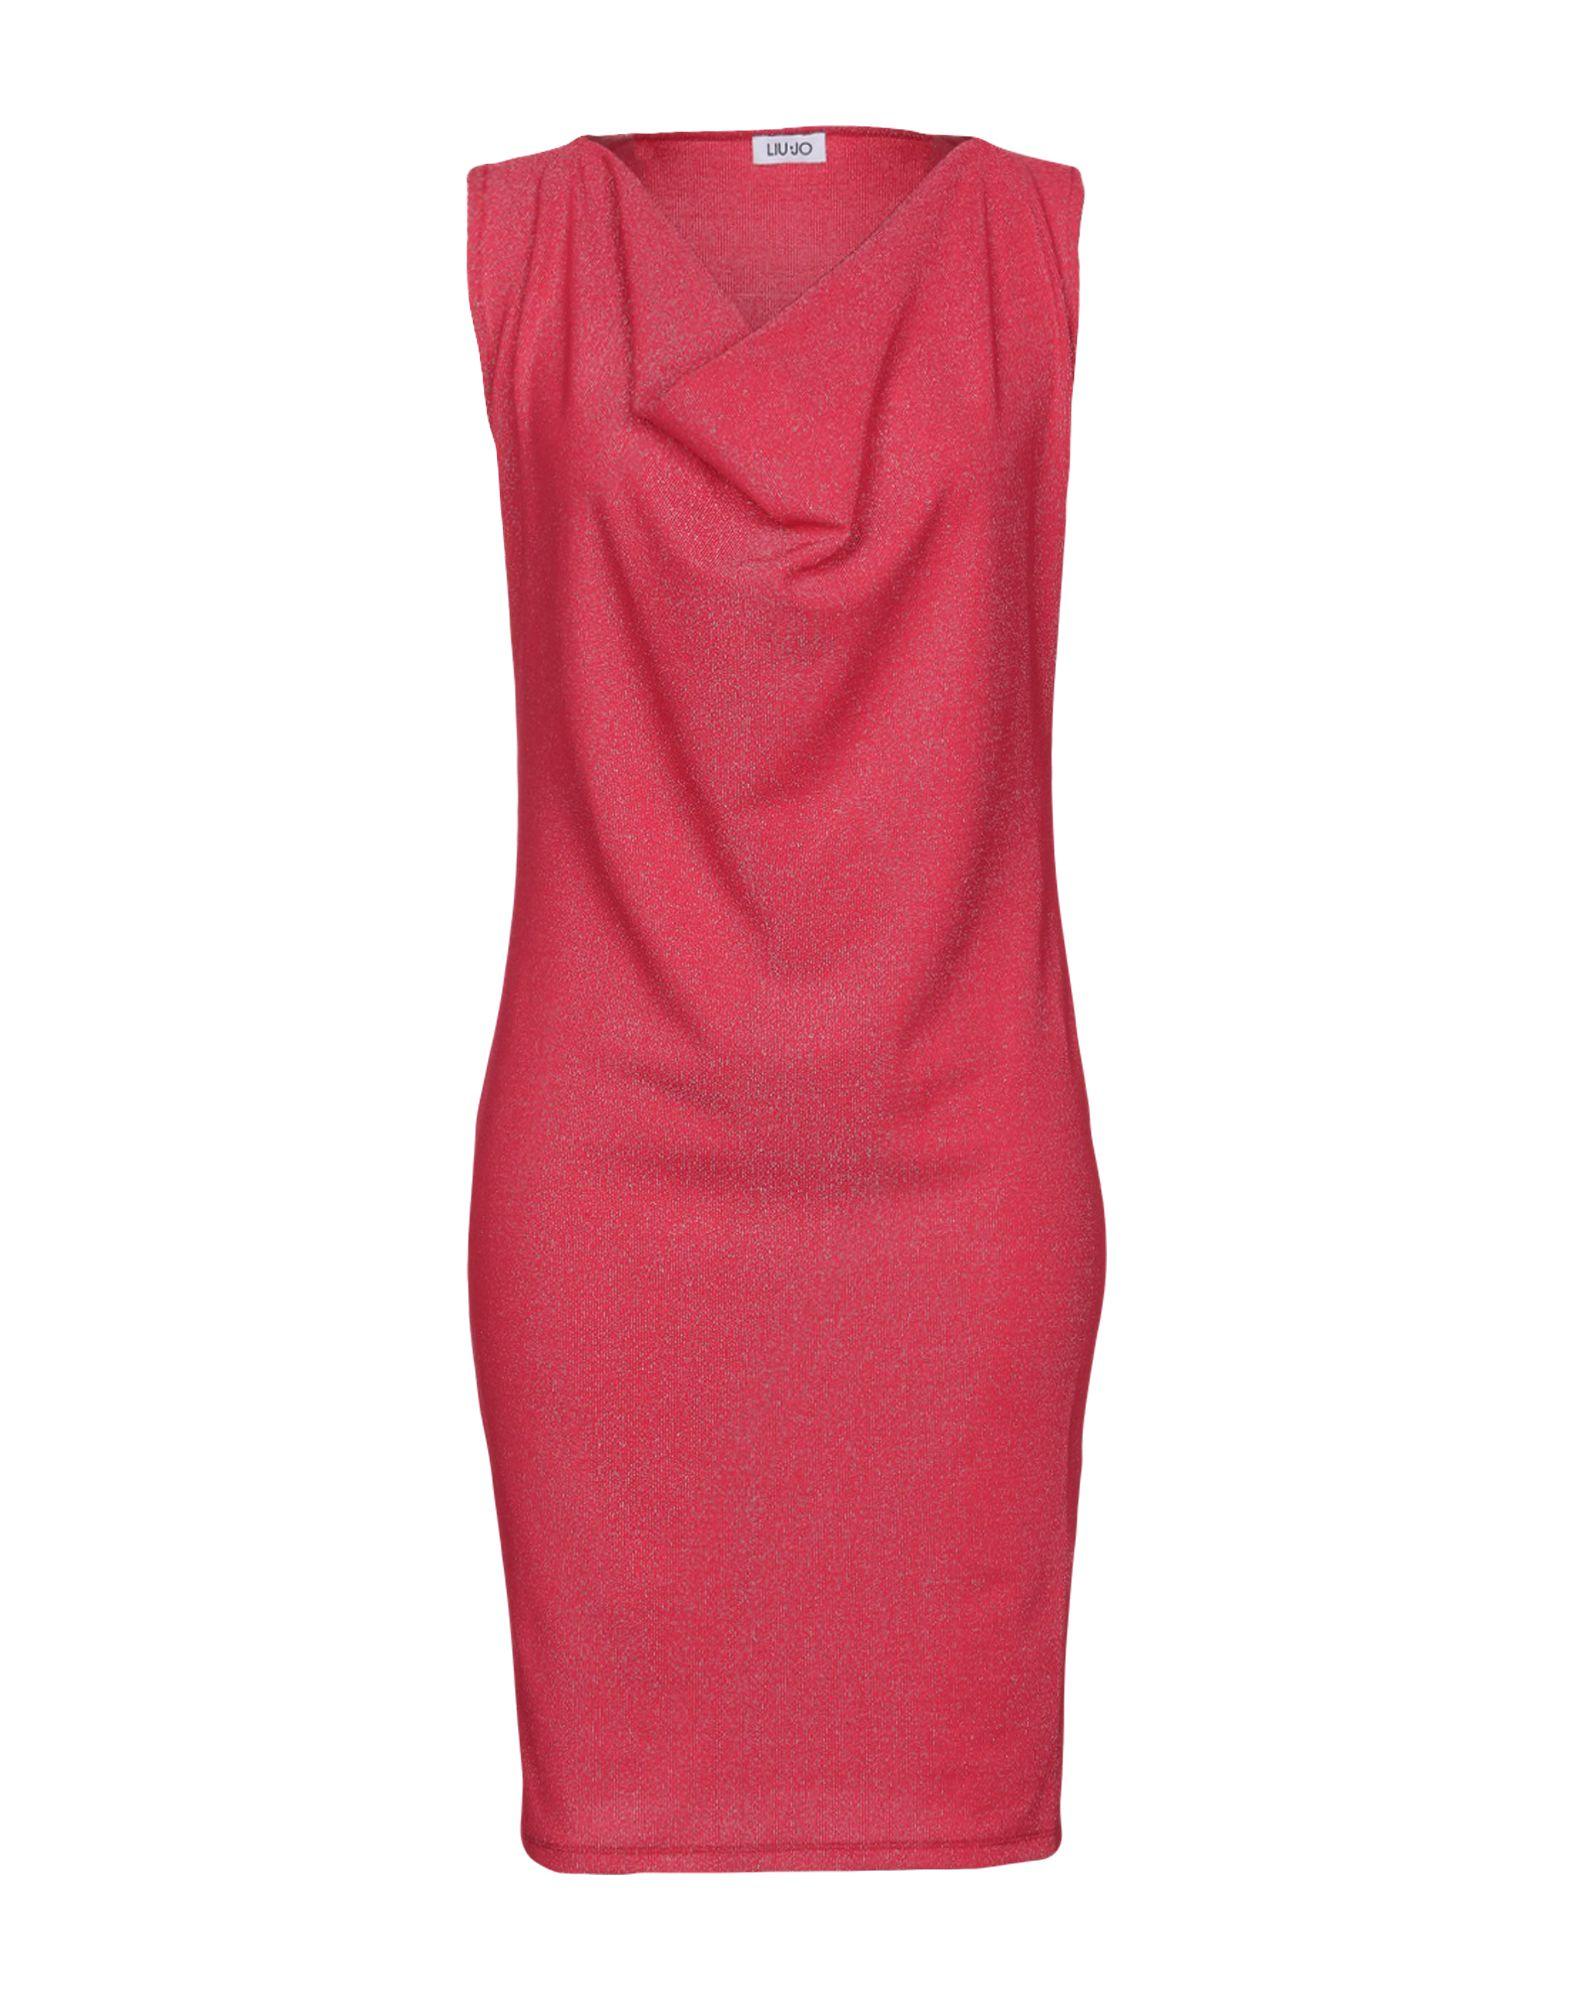 9412ed426b Yoox - Γυναικεία Κοντά Φορέματα - Σελίδα 1163